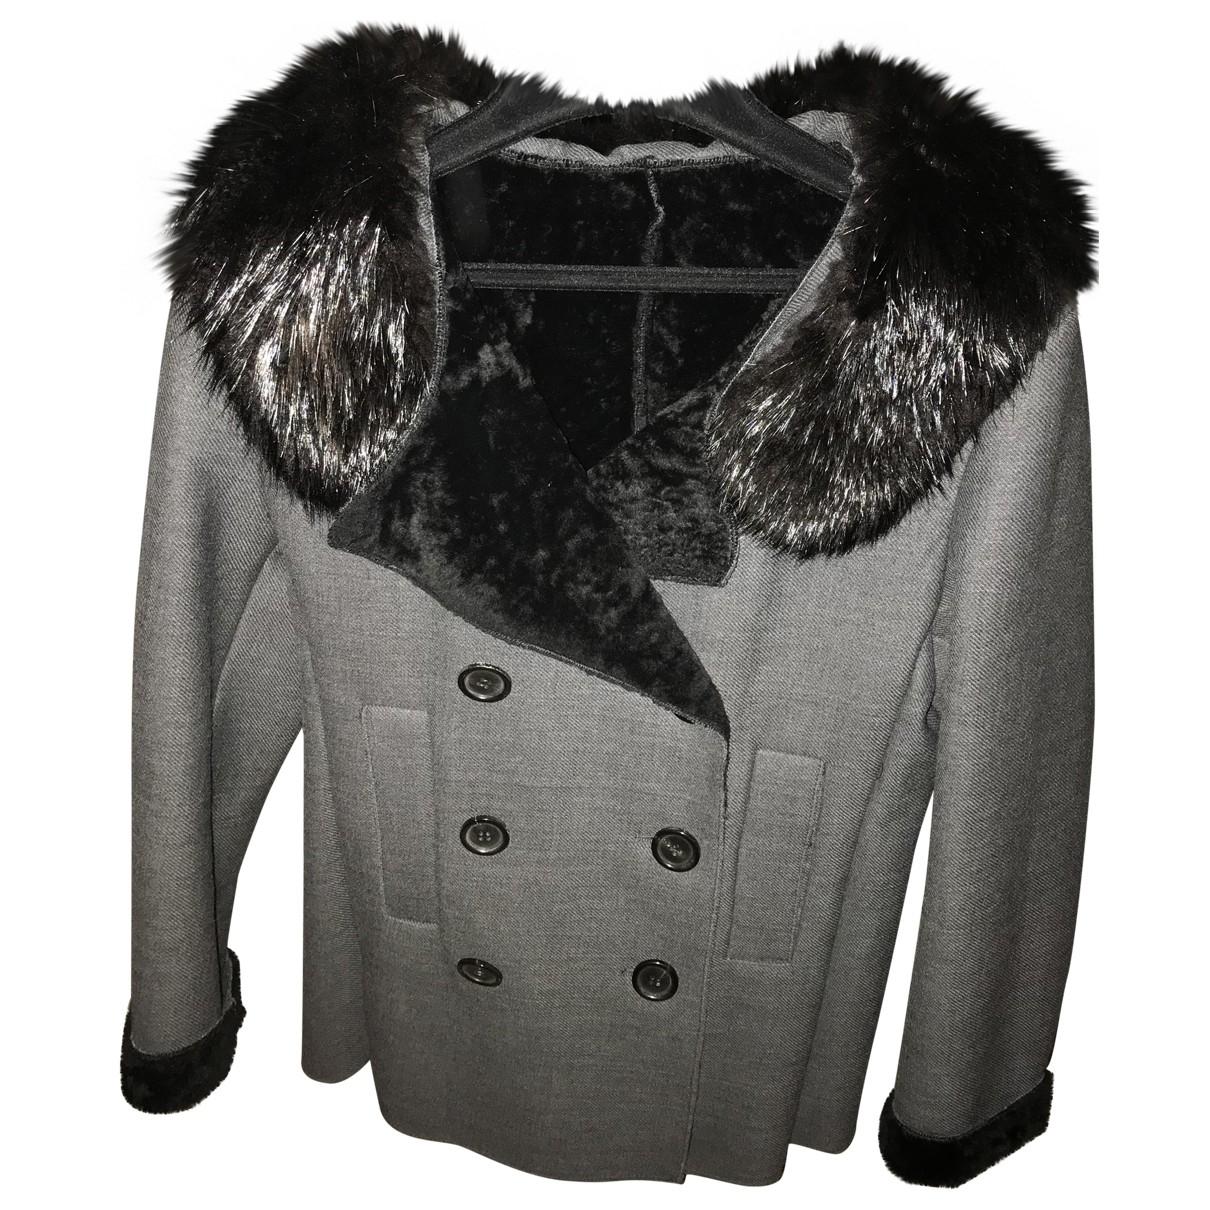 Prada \N Maentel in  Grau Wolle